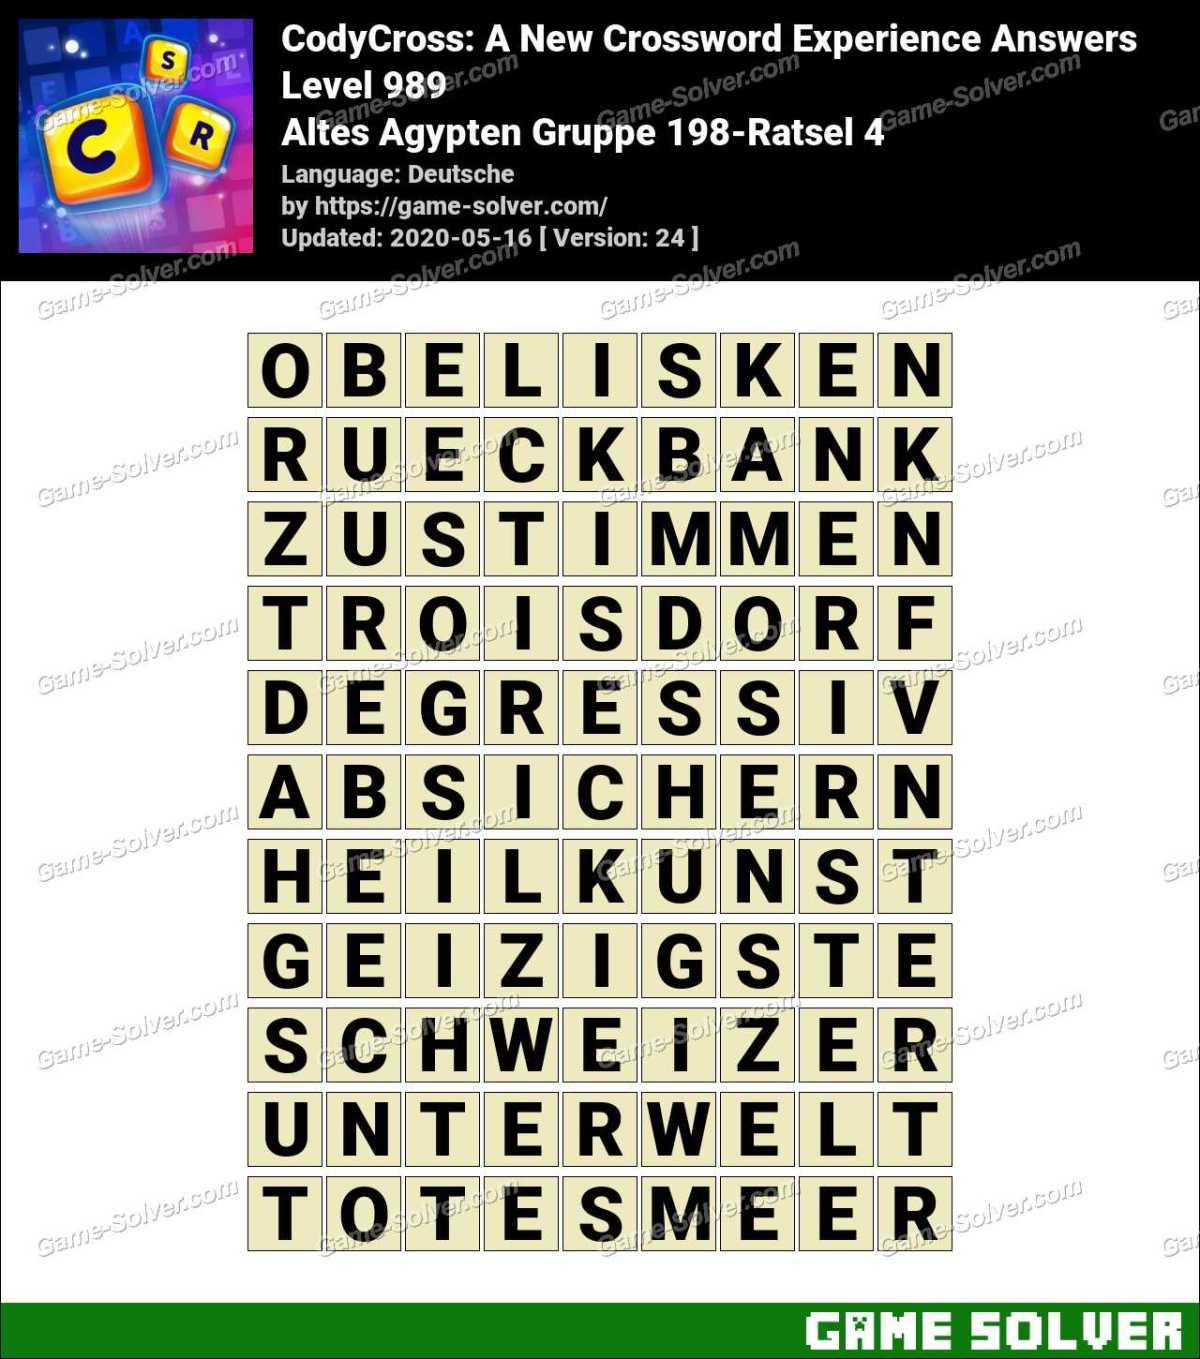 CodyCross Altes Agypten Gruppe 198-Ratsel 4 Lösungen